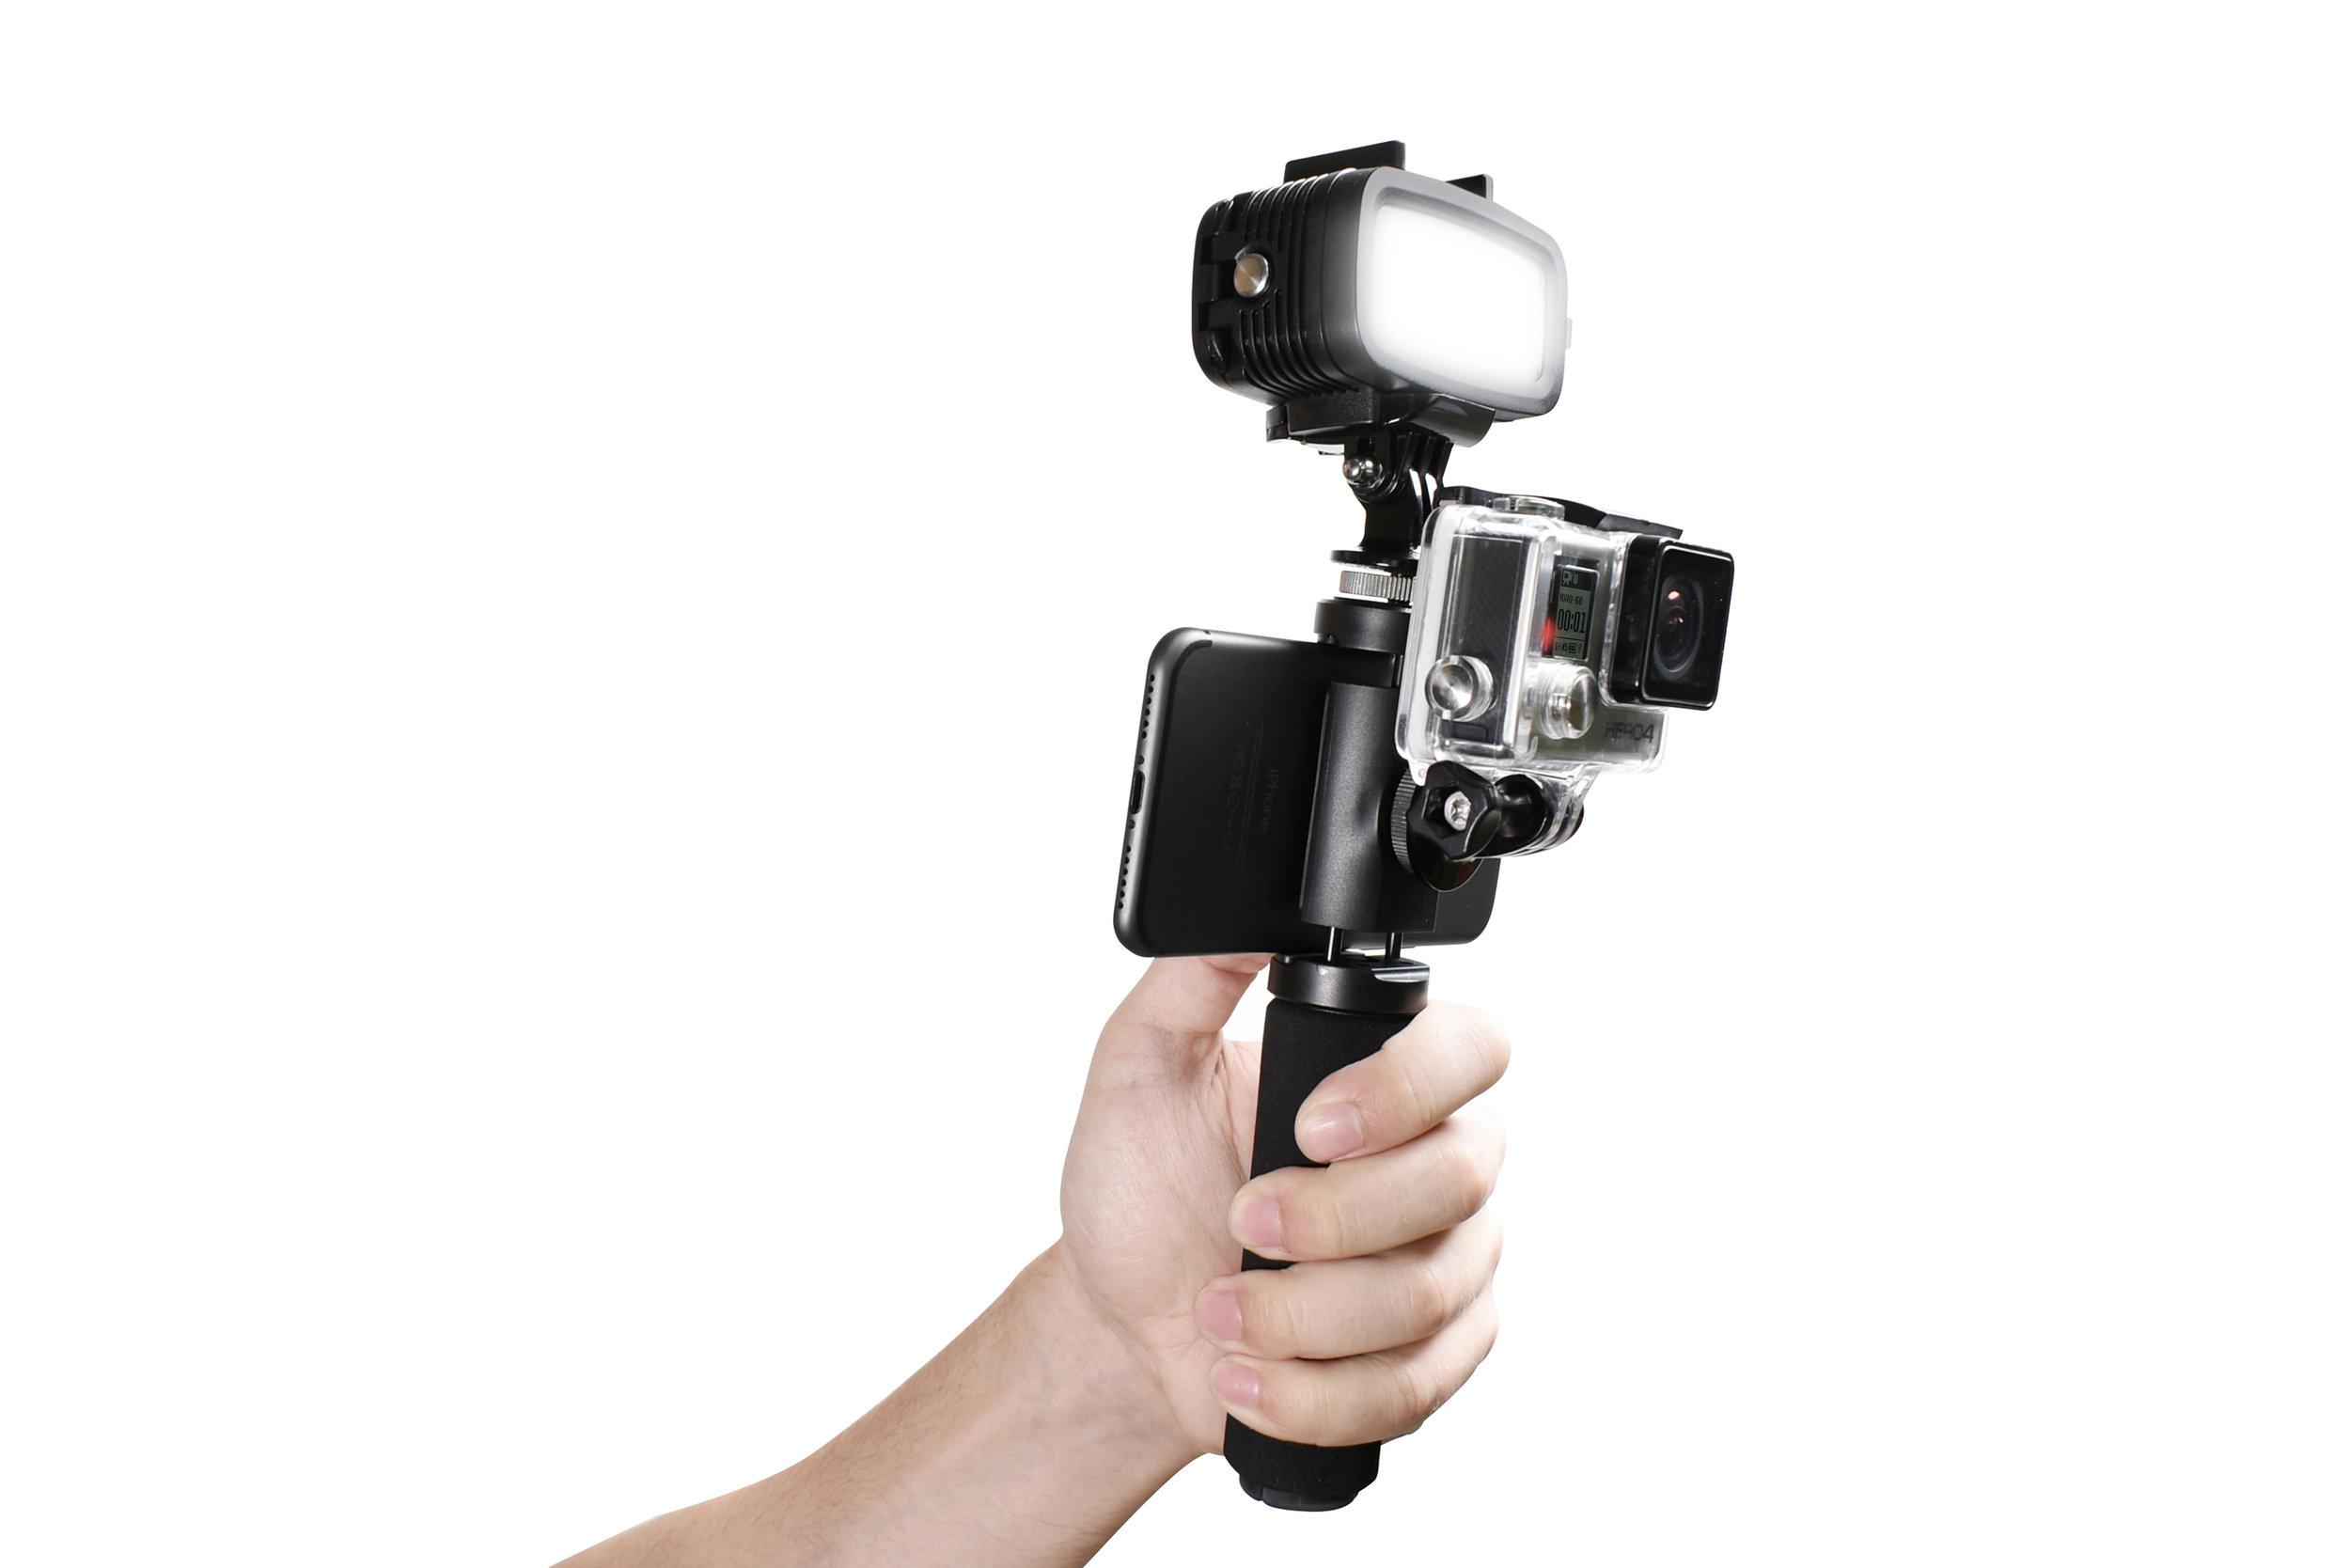 PIca-Gear Pica-Grip ultimate action cam handle gear organizer